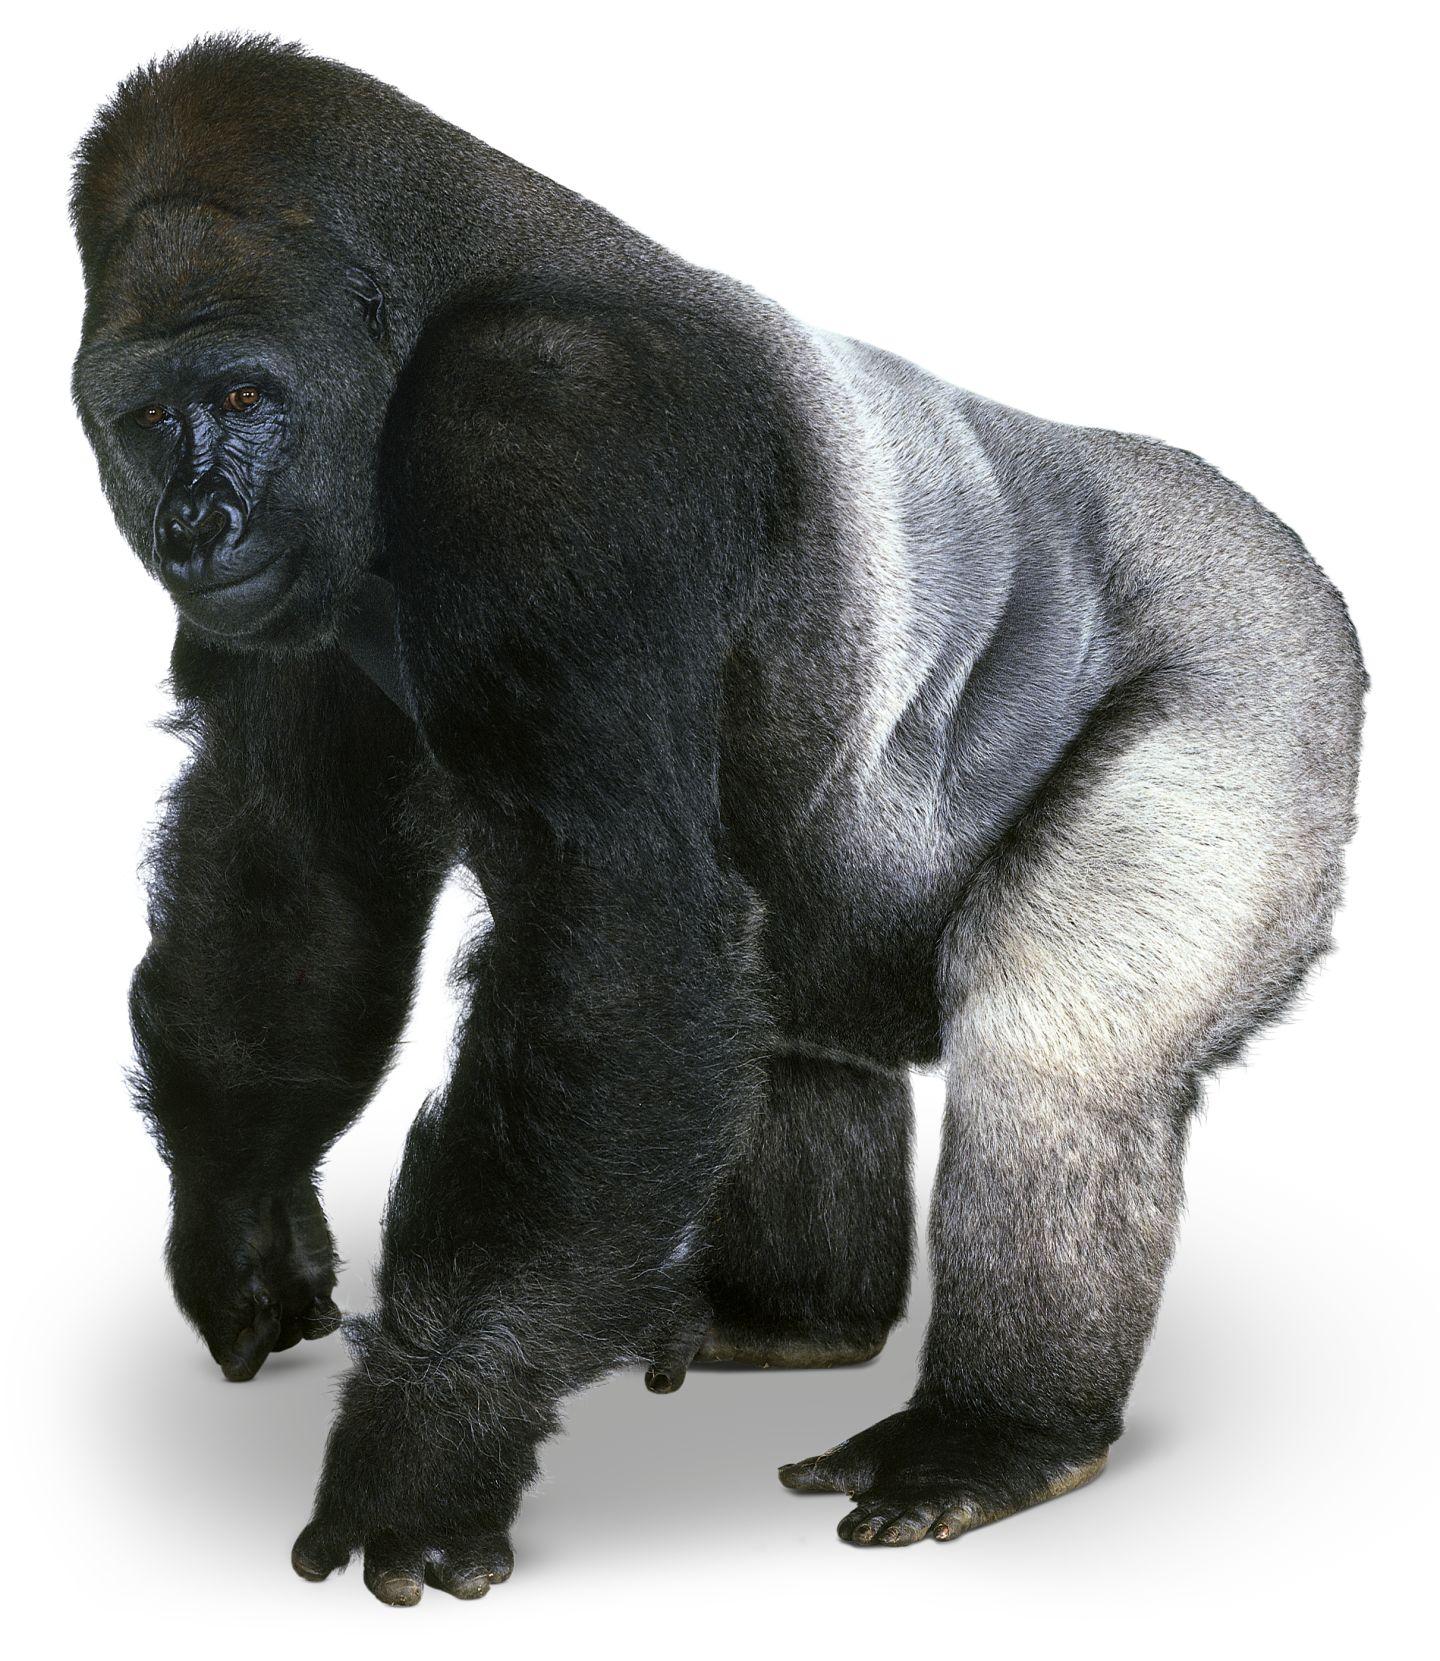 Gorilla PNG - 12148